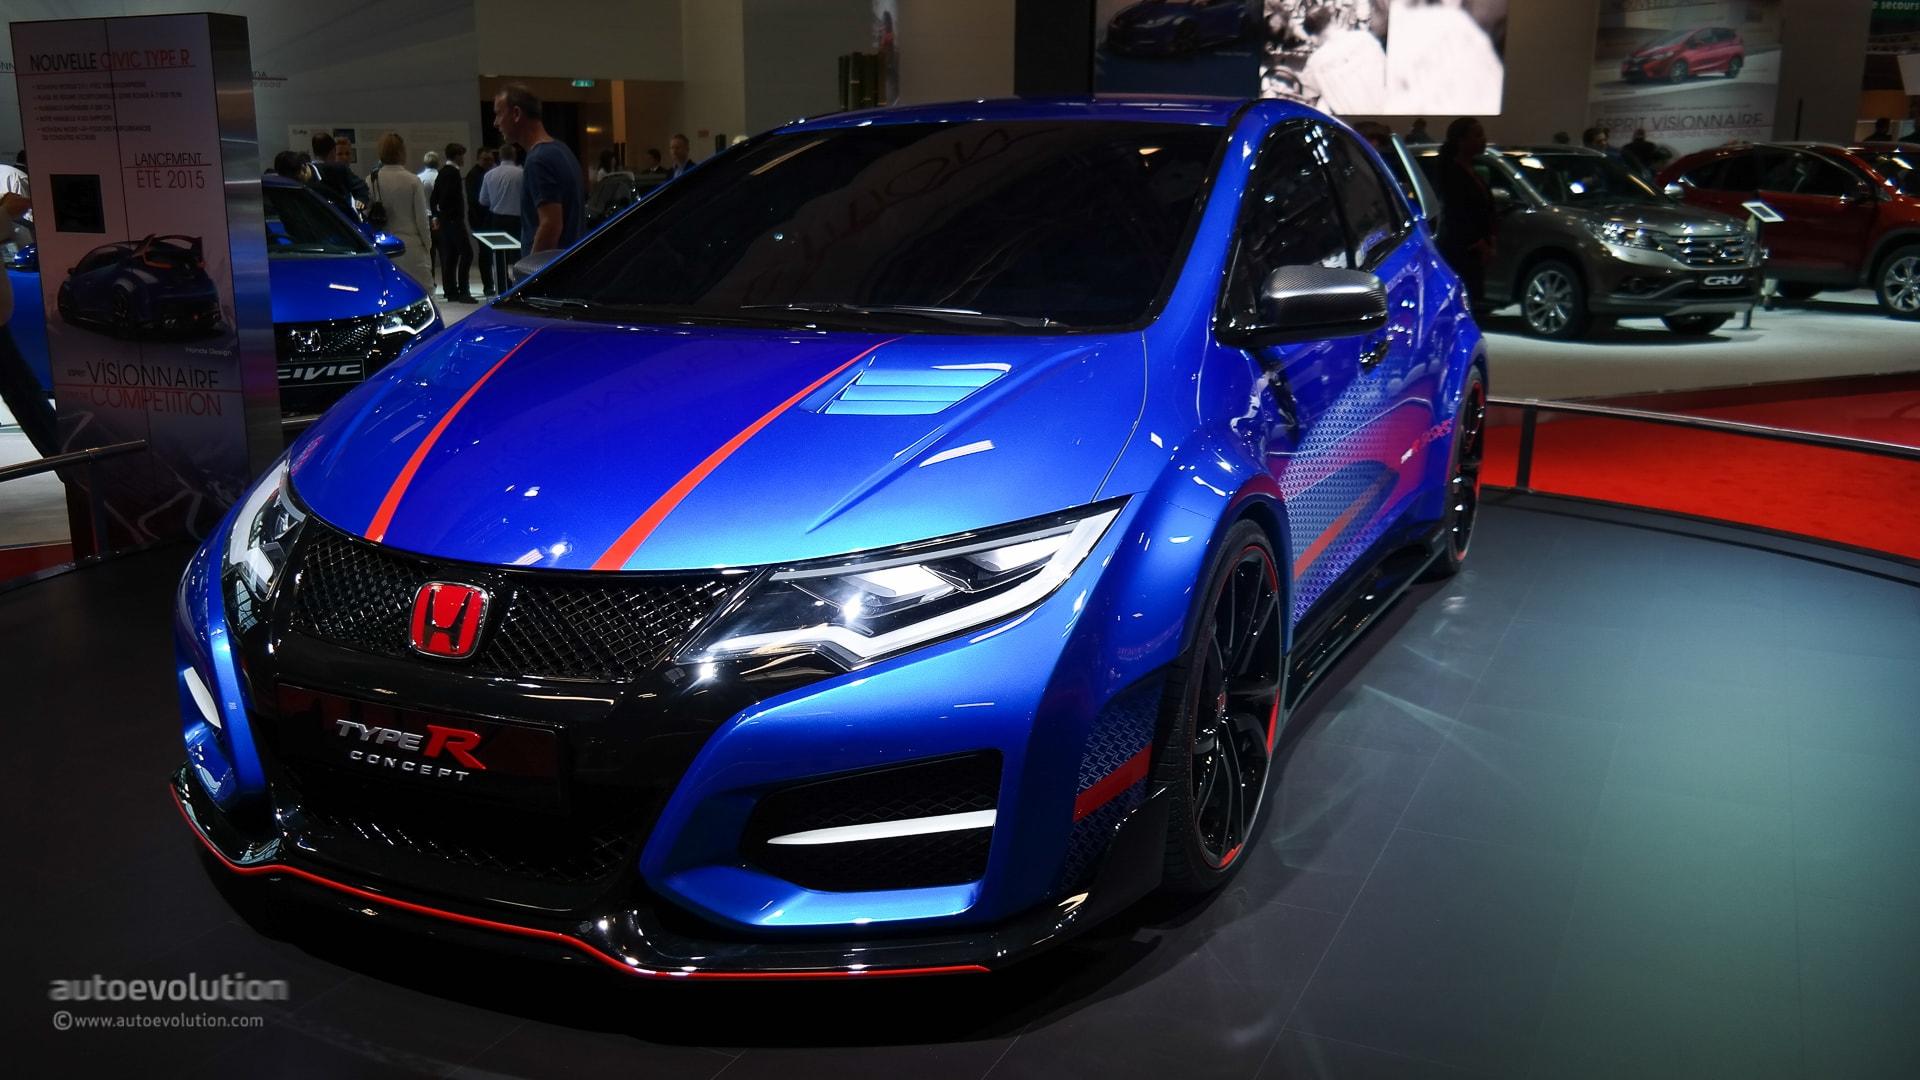 Honda Civic Type-R Widescreen for desktop